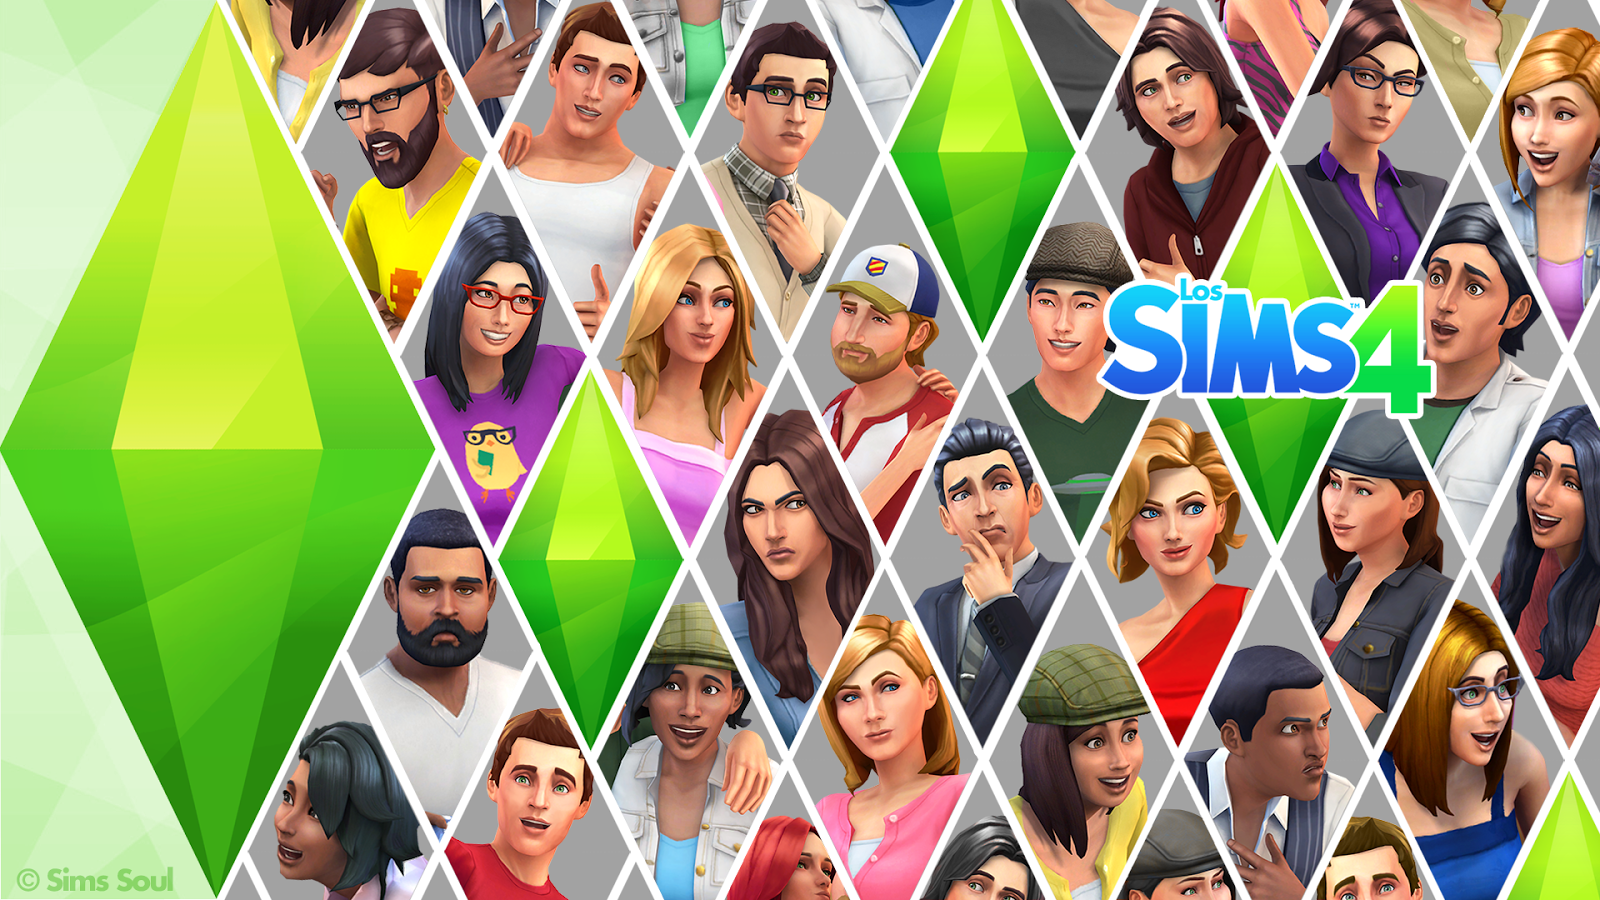 Sims 4 hình nền